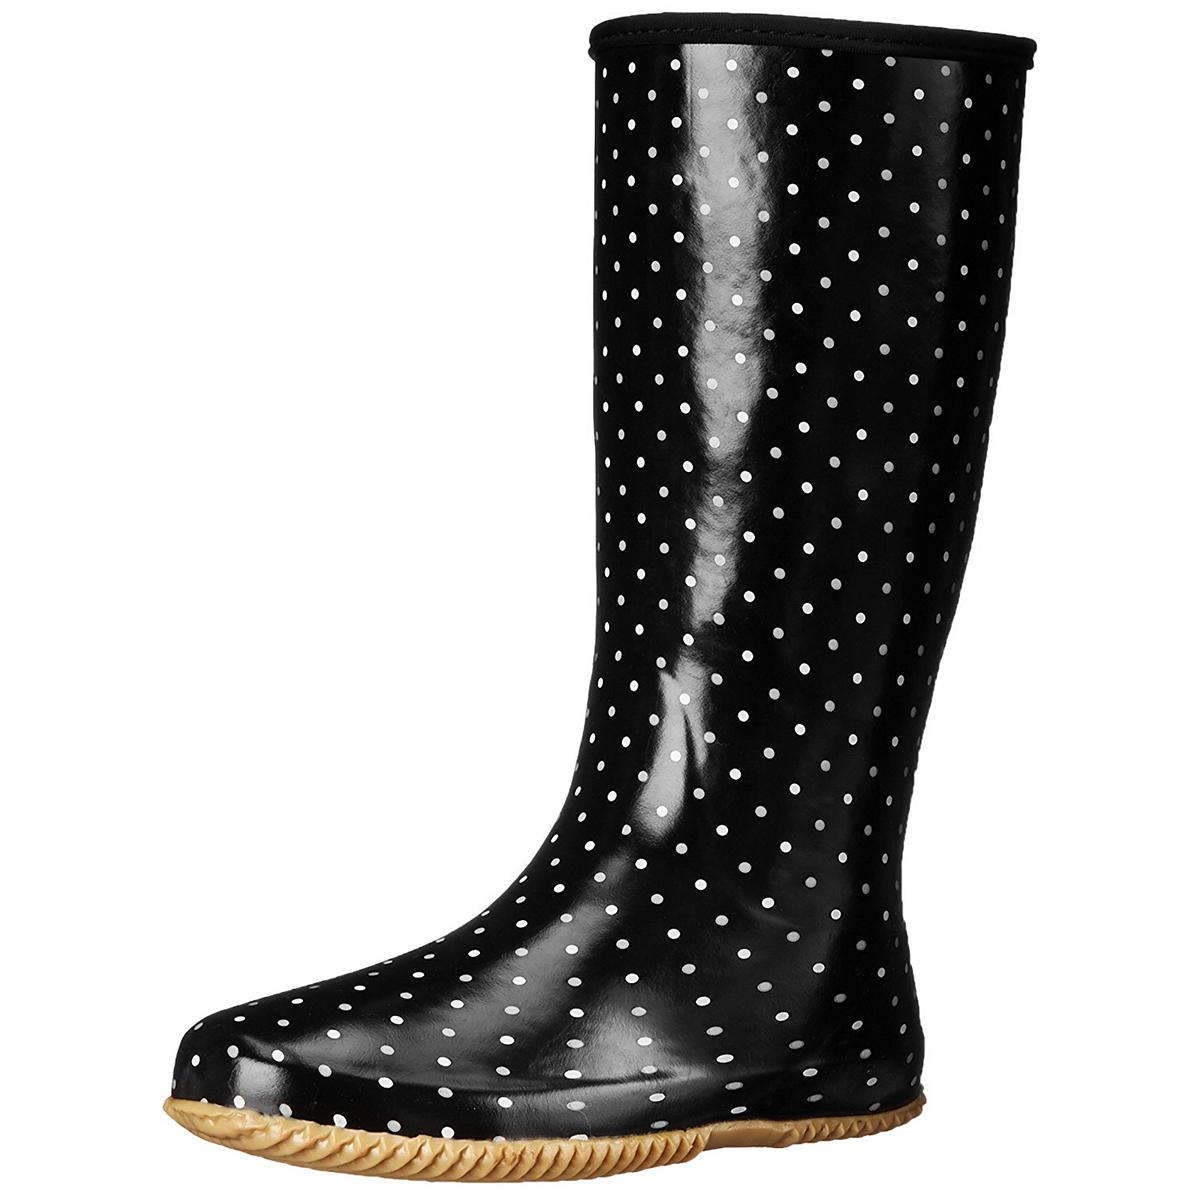 Chooka-Women-039-s-Rubber-Rain-Boots-Mid-Calf-With-Lightweight-Packable-Travel-Bag thumbnail 17